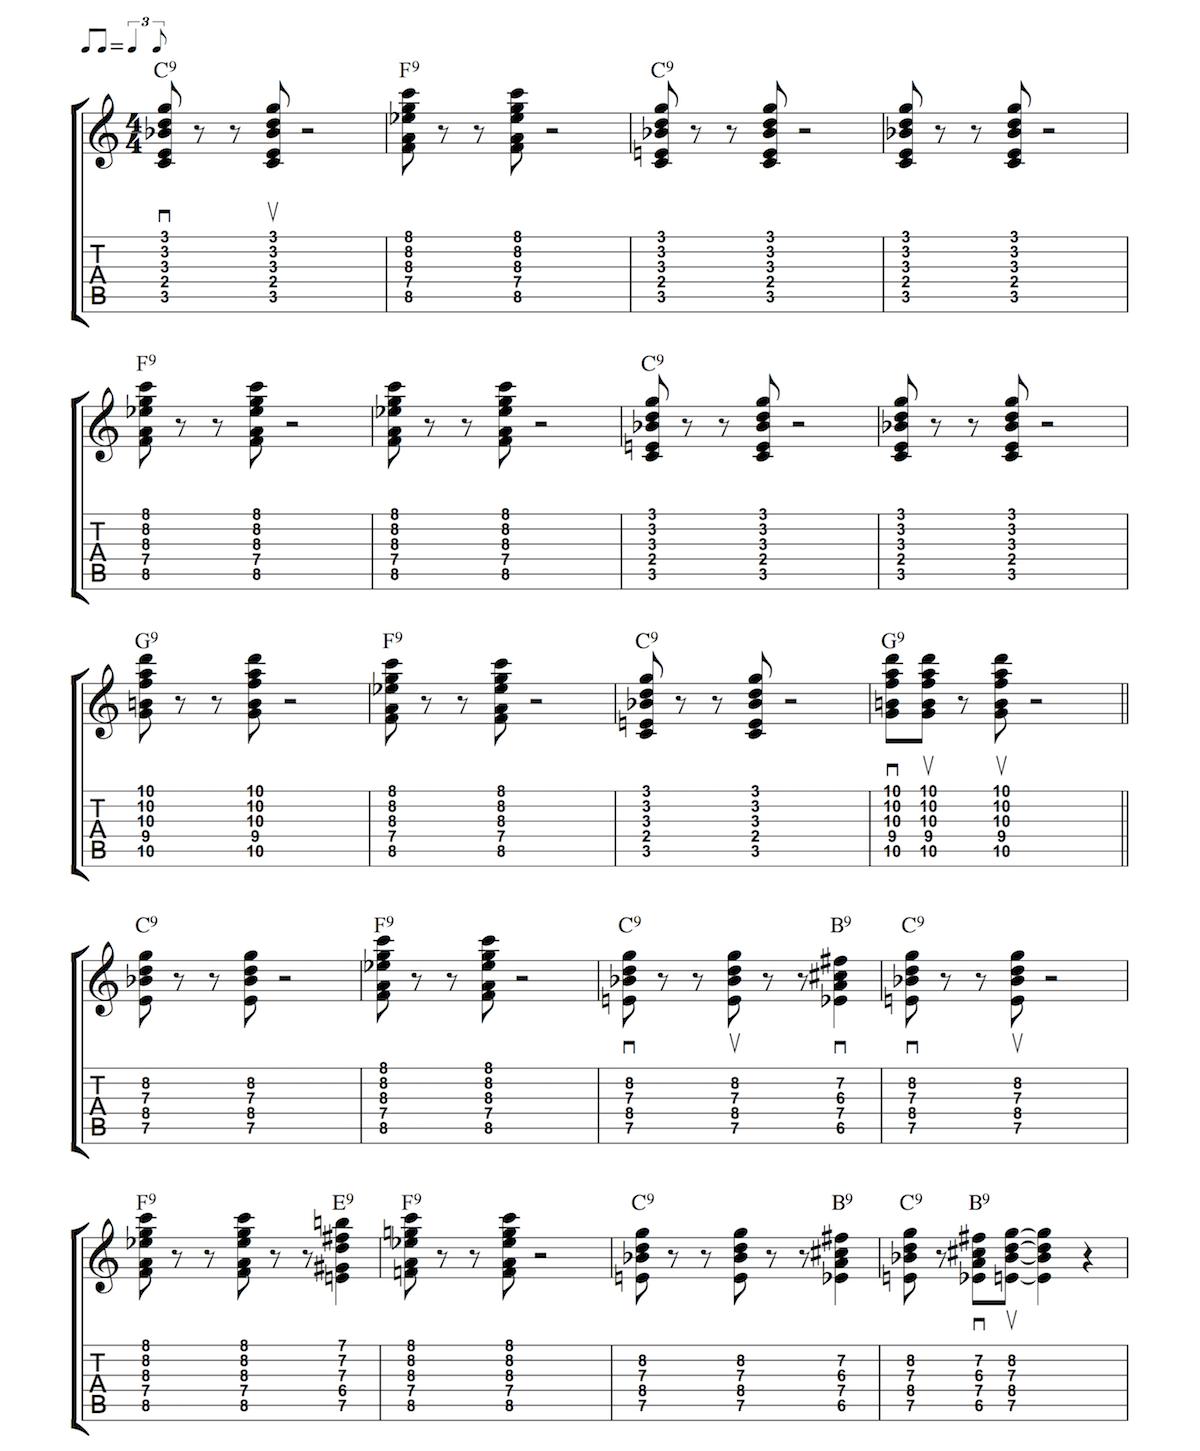 Blues Rhythm 4 9th Chords Anyone Can Play Guitar